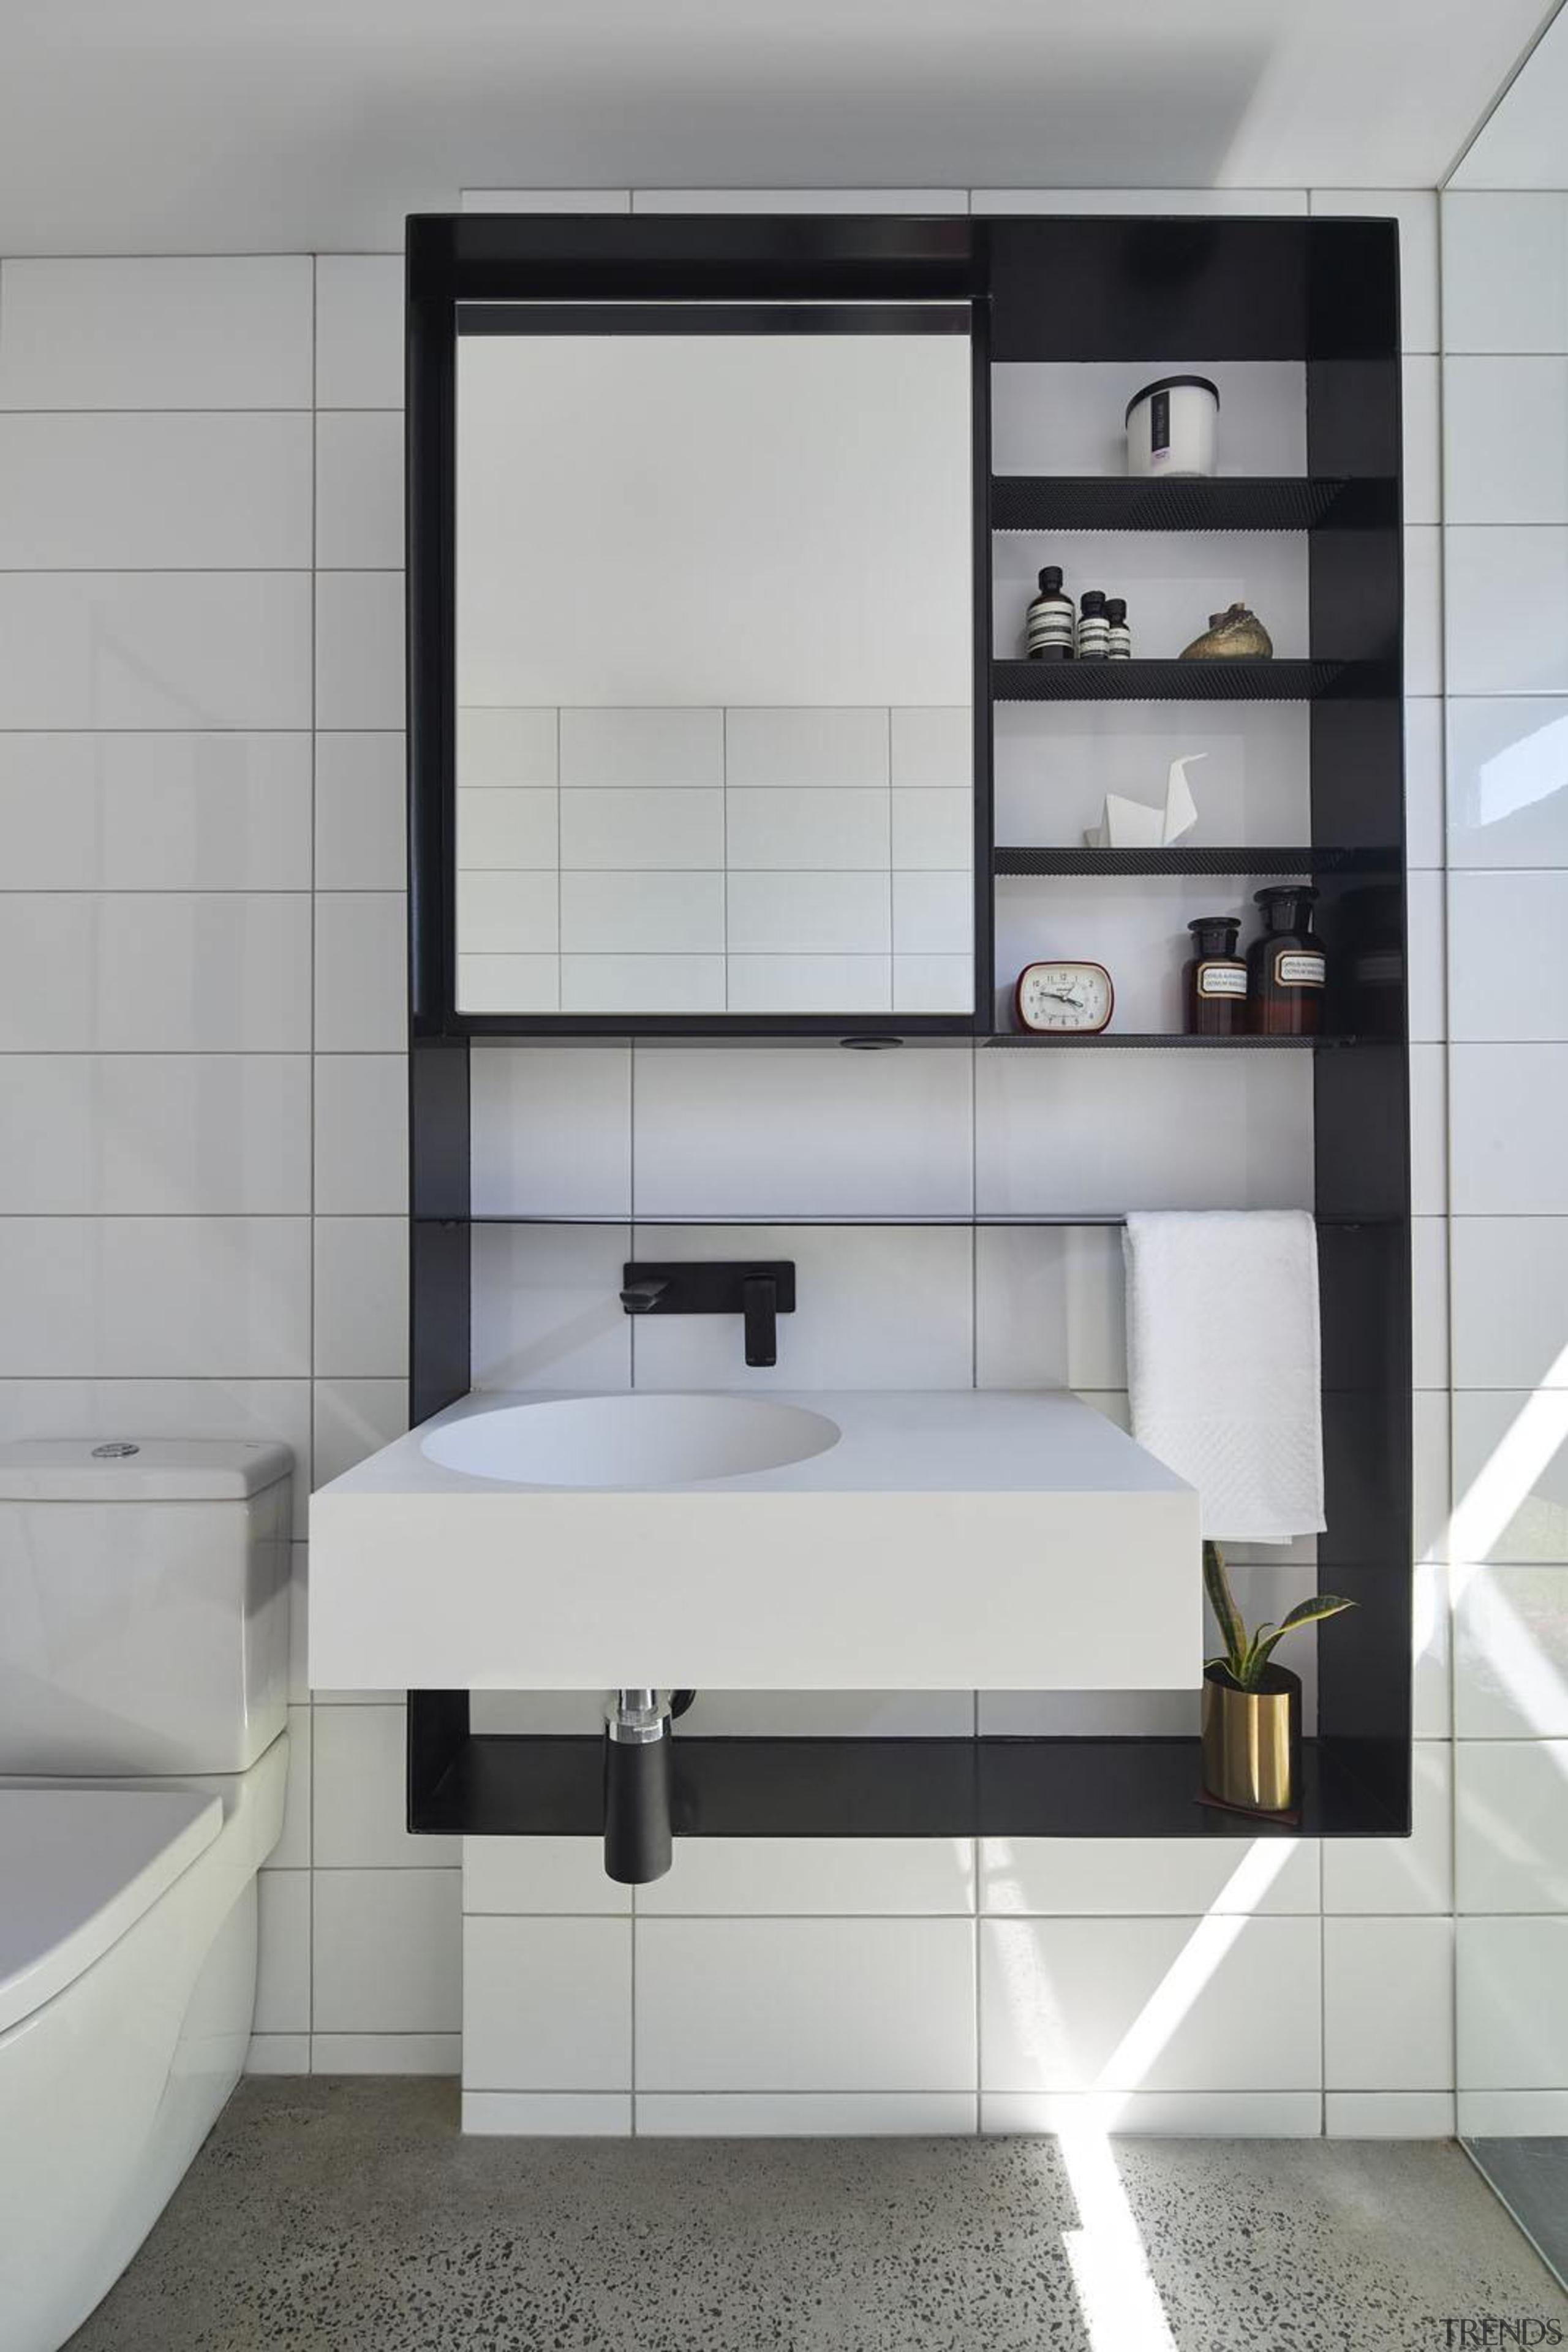 Architect: Austin Maynard ArchitectsPhotography by Peter Bennetts bathroom, bathroom accessory, bathroom cabinet, floor, interior design, product, product design, sink, gray